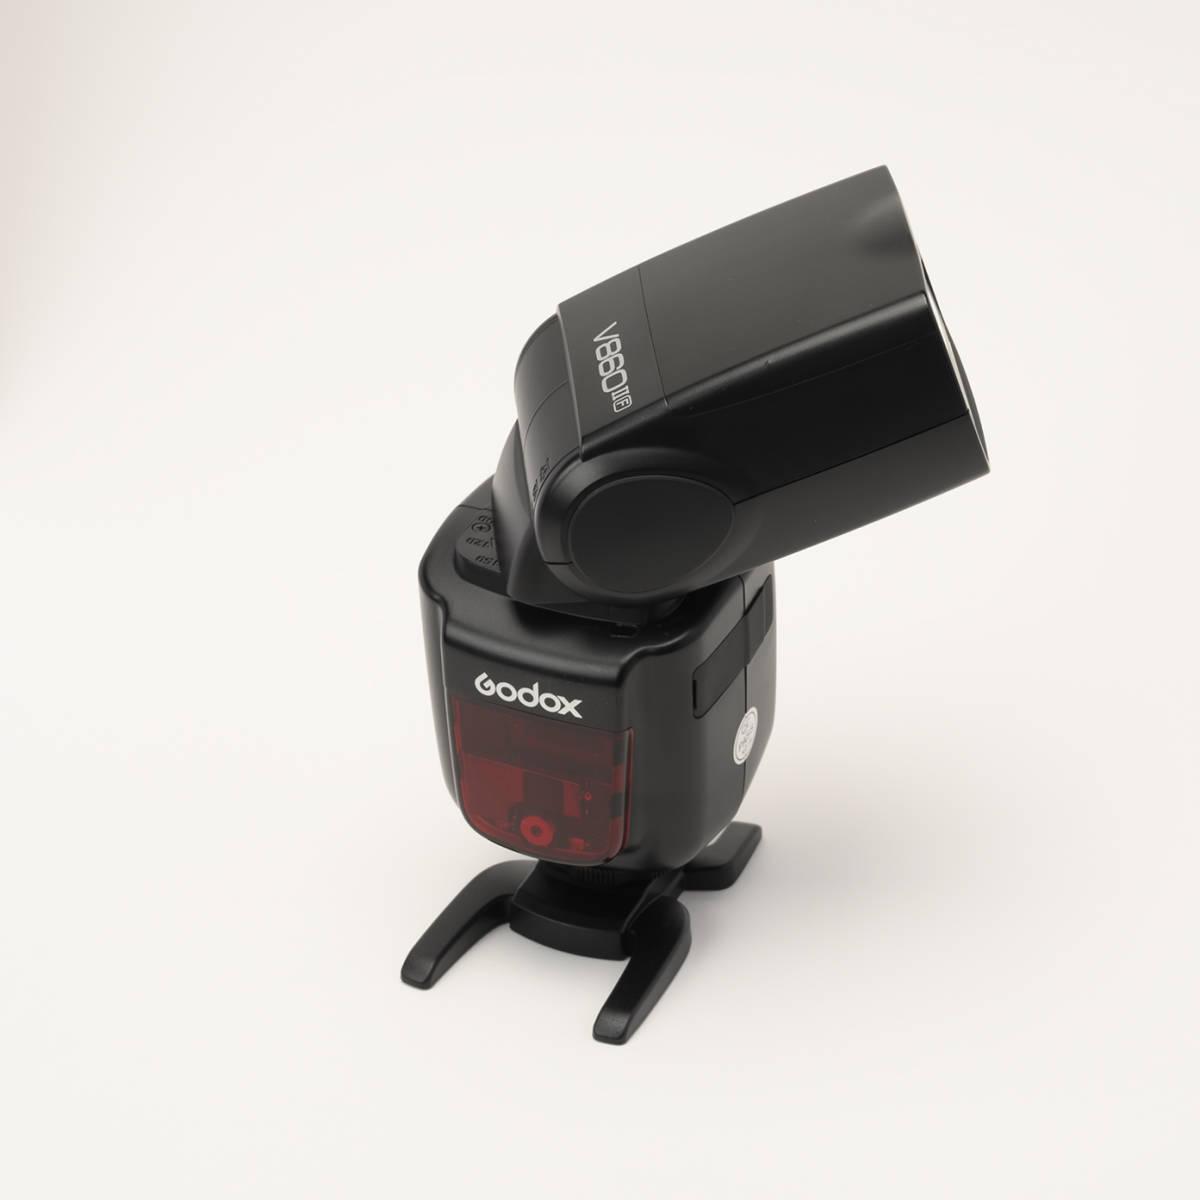 Godox V860IIF 富士カメラ用 カメラフラッシュ 2.4GHz ワイヤレスX1システム TTL GN60 充電式電池_画像6